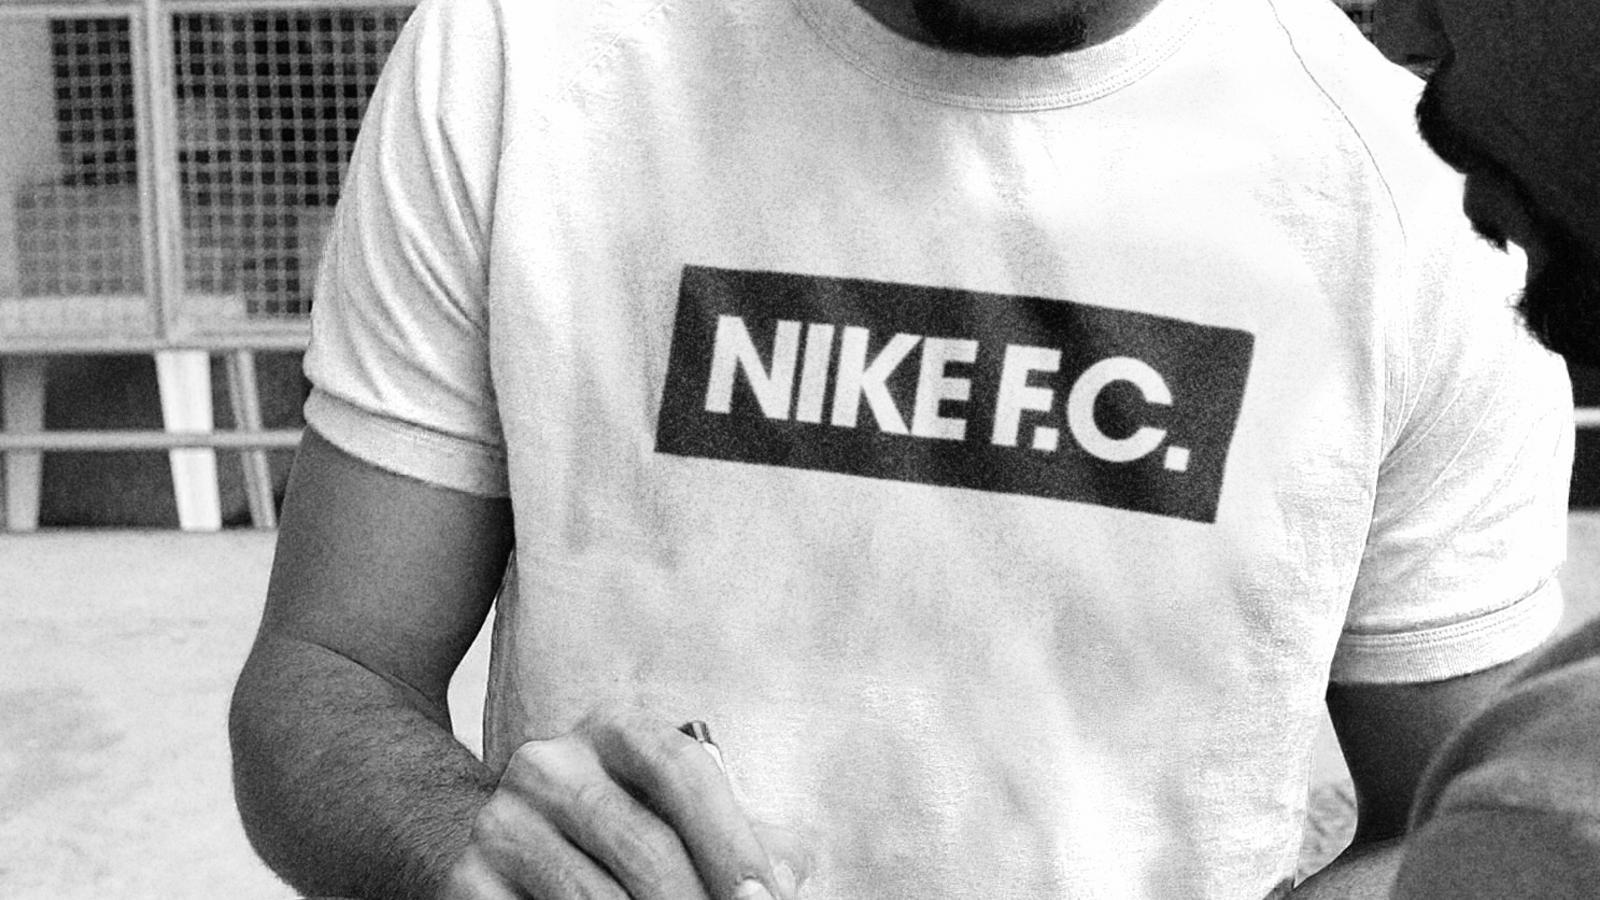 We Don't Play Football, We Live it: Nike F.C. Nike News